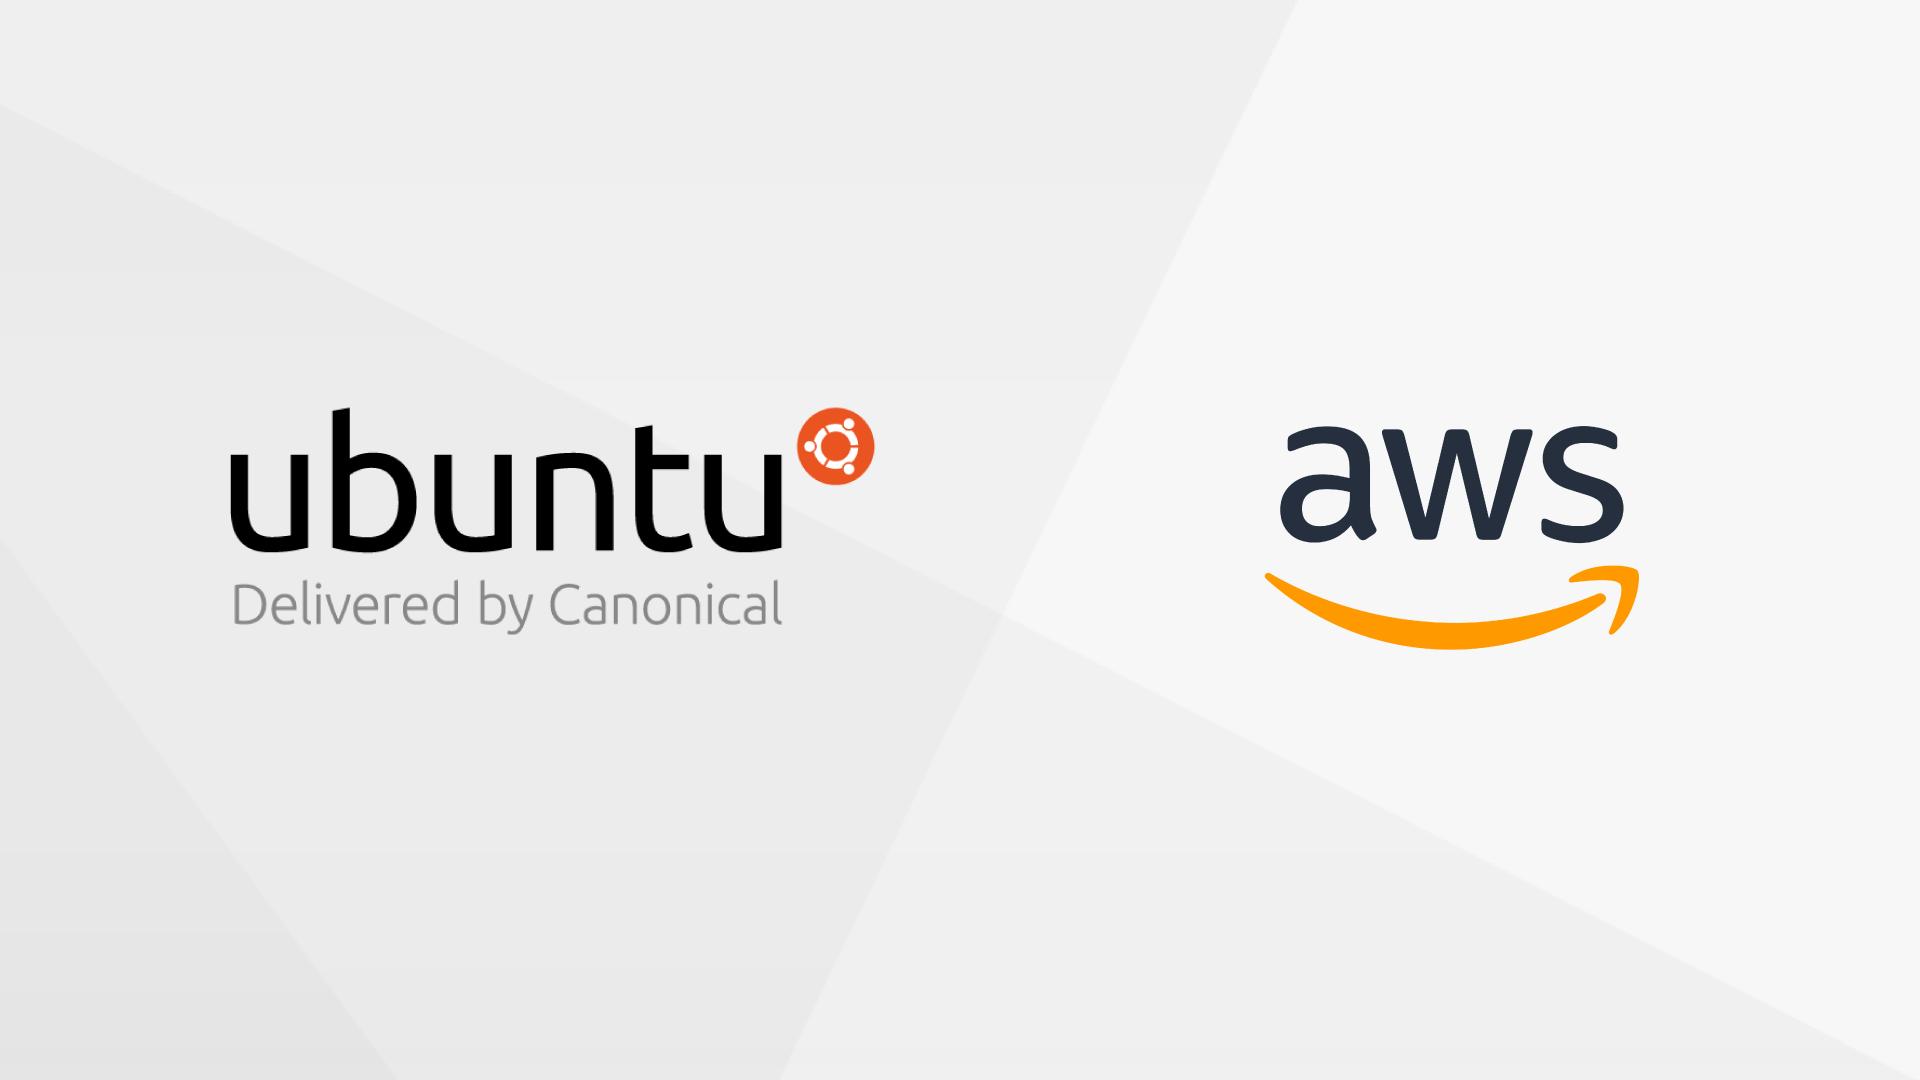 ubuntu, Amazon EC2, AWS, 16.04, LTS